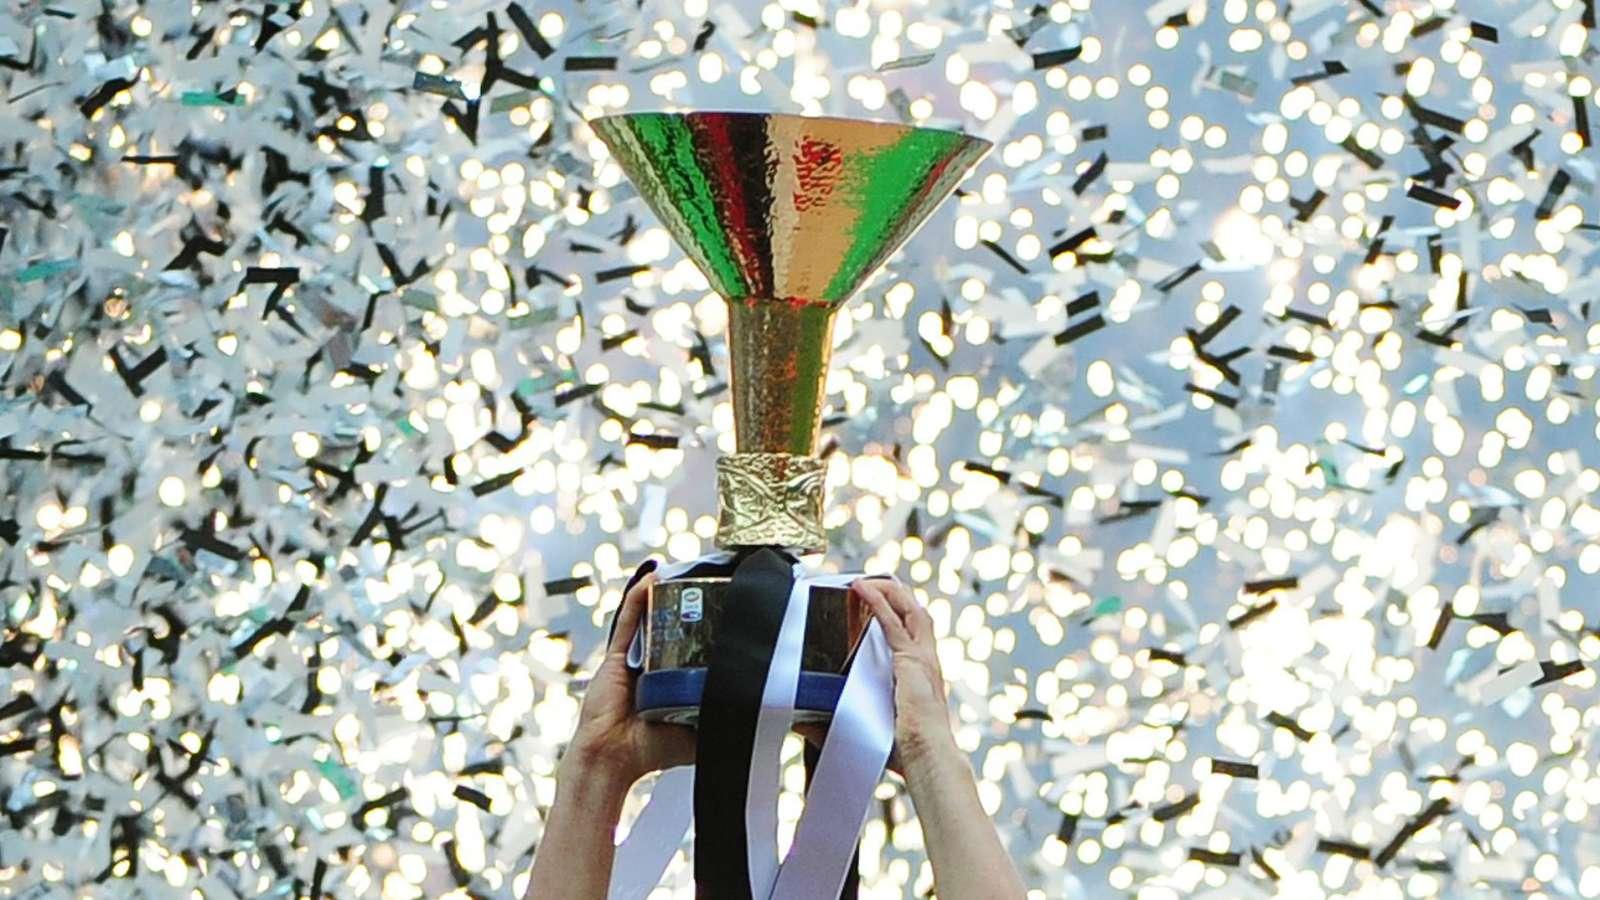 https: img.okeinfo.net content 2020 04 06 47 2194632 presiden-figc-buka-peluang-selesaikan-liga-italia-hingga-oktober-2020-UsmXaZ2iIk.jpg